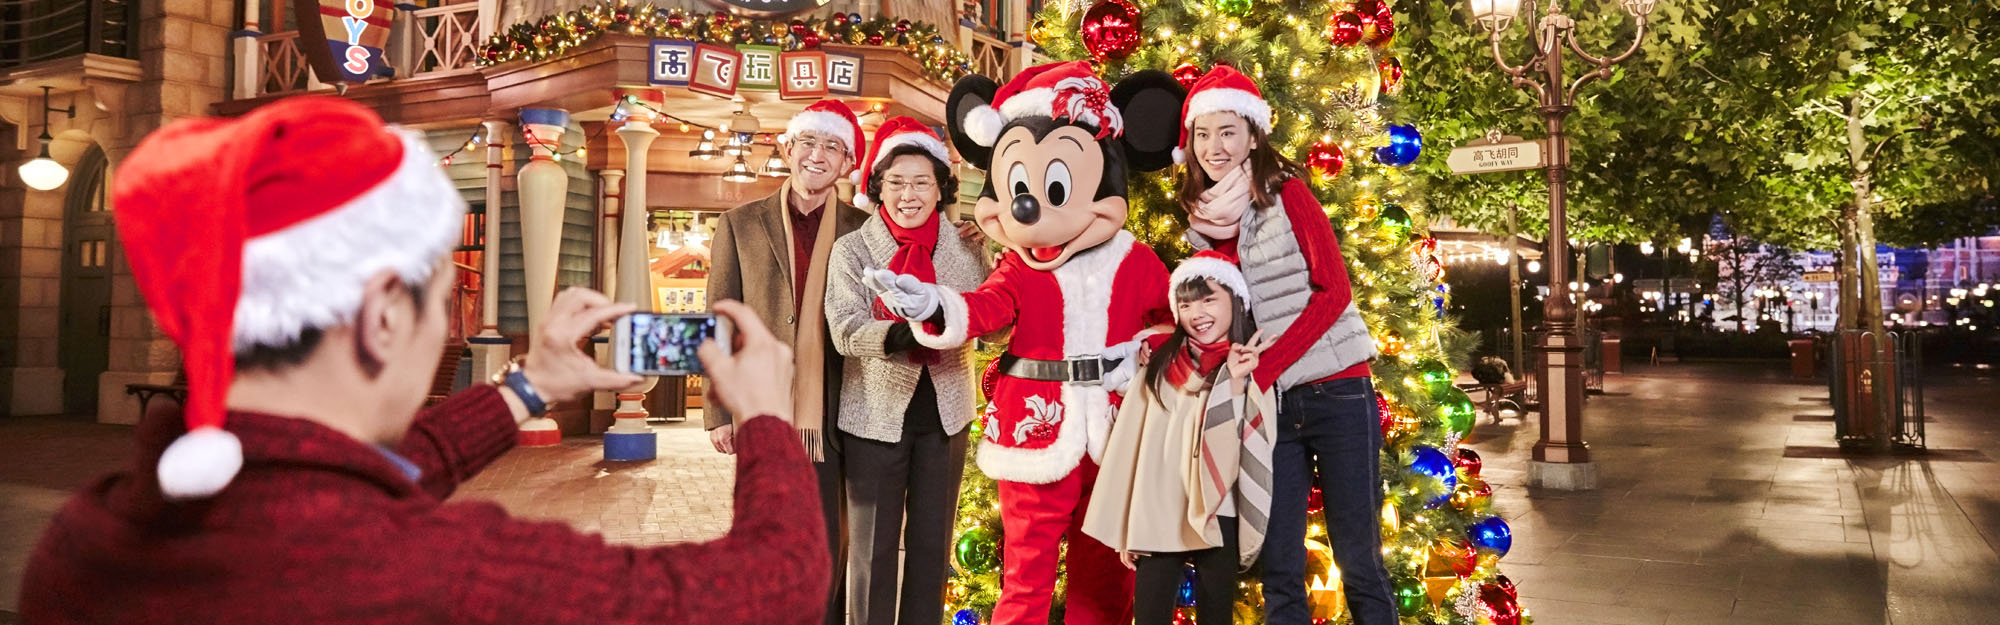 disneys-magical-holiday-celebration